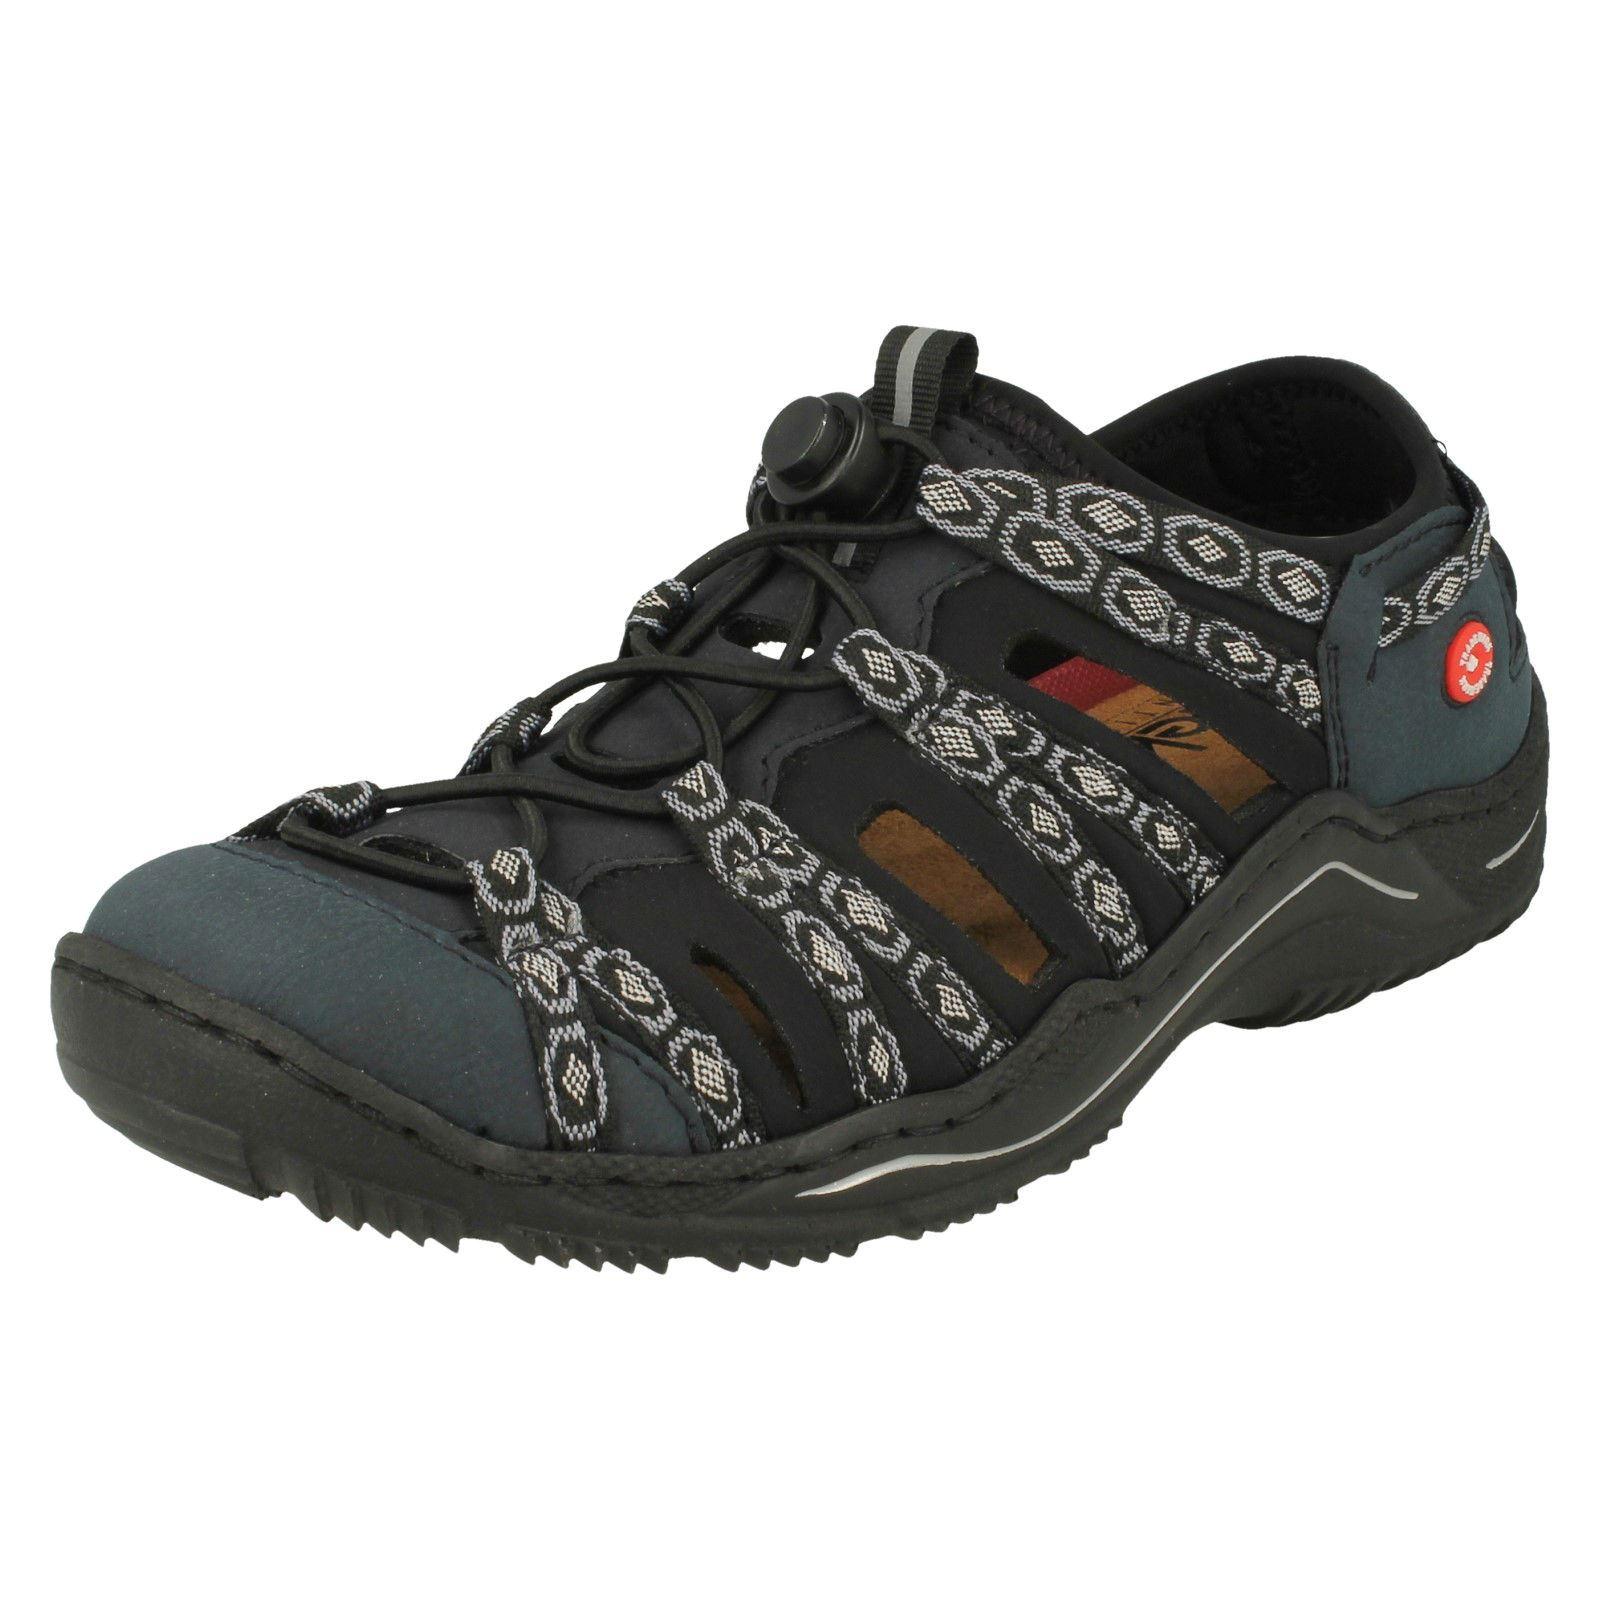 Sandalo L * Donna Rieker sportivo * L L Sandalo 0577 * 1f71d0 smarmie  6367f6